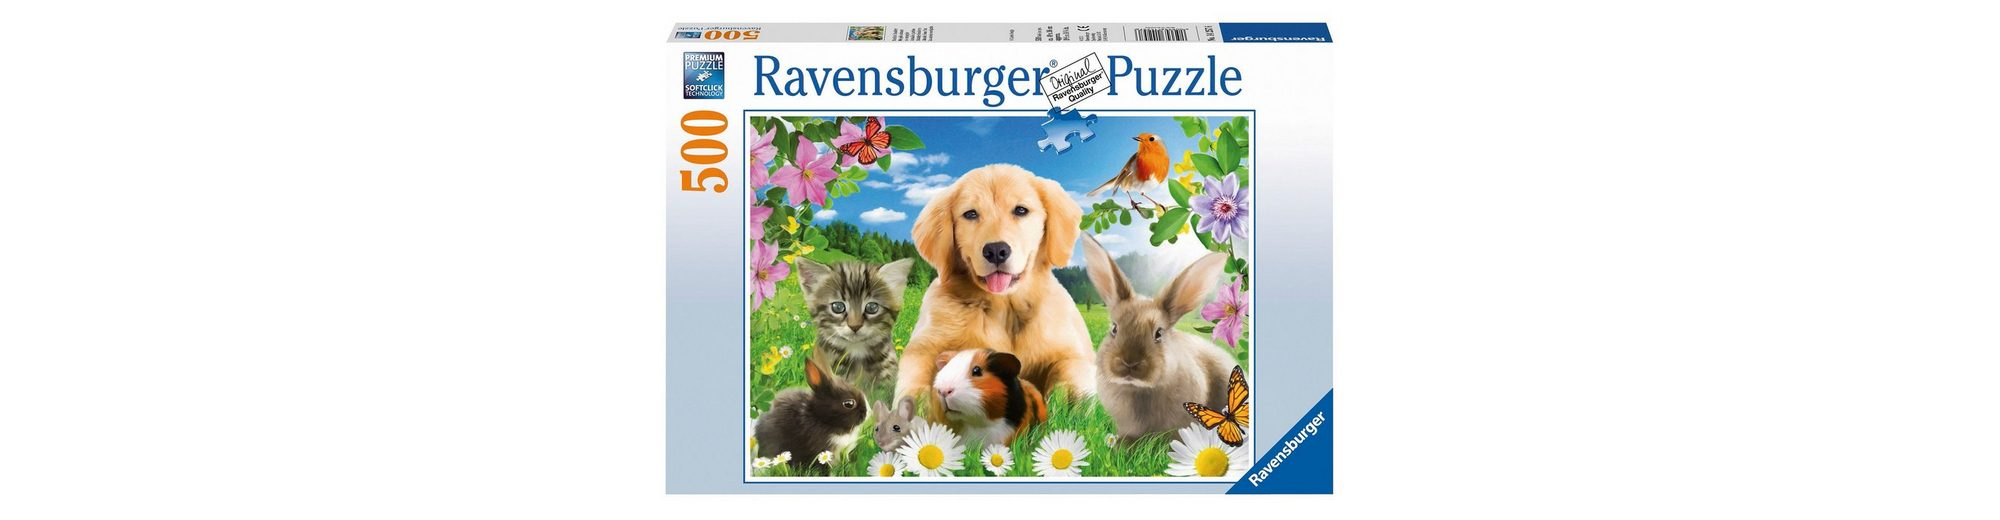 Ravensburger Puzzle 500 Teile, »Niedliche Haustiere«